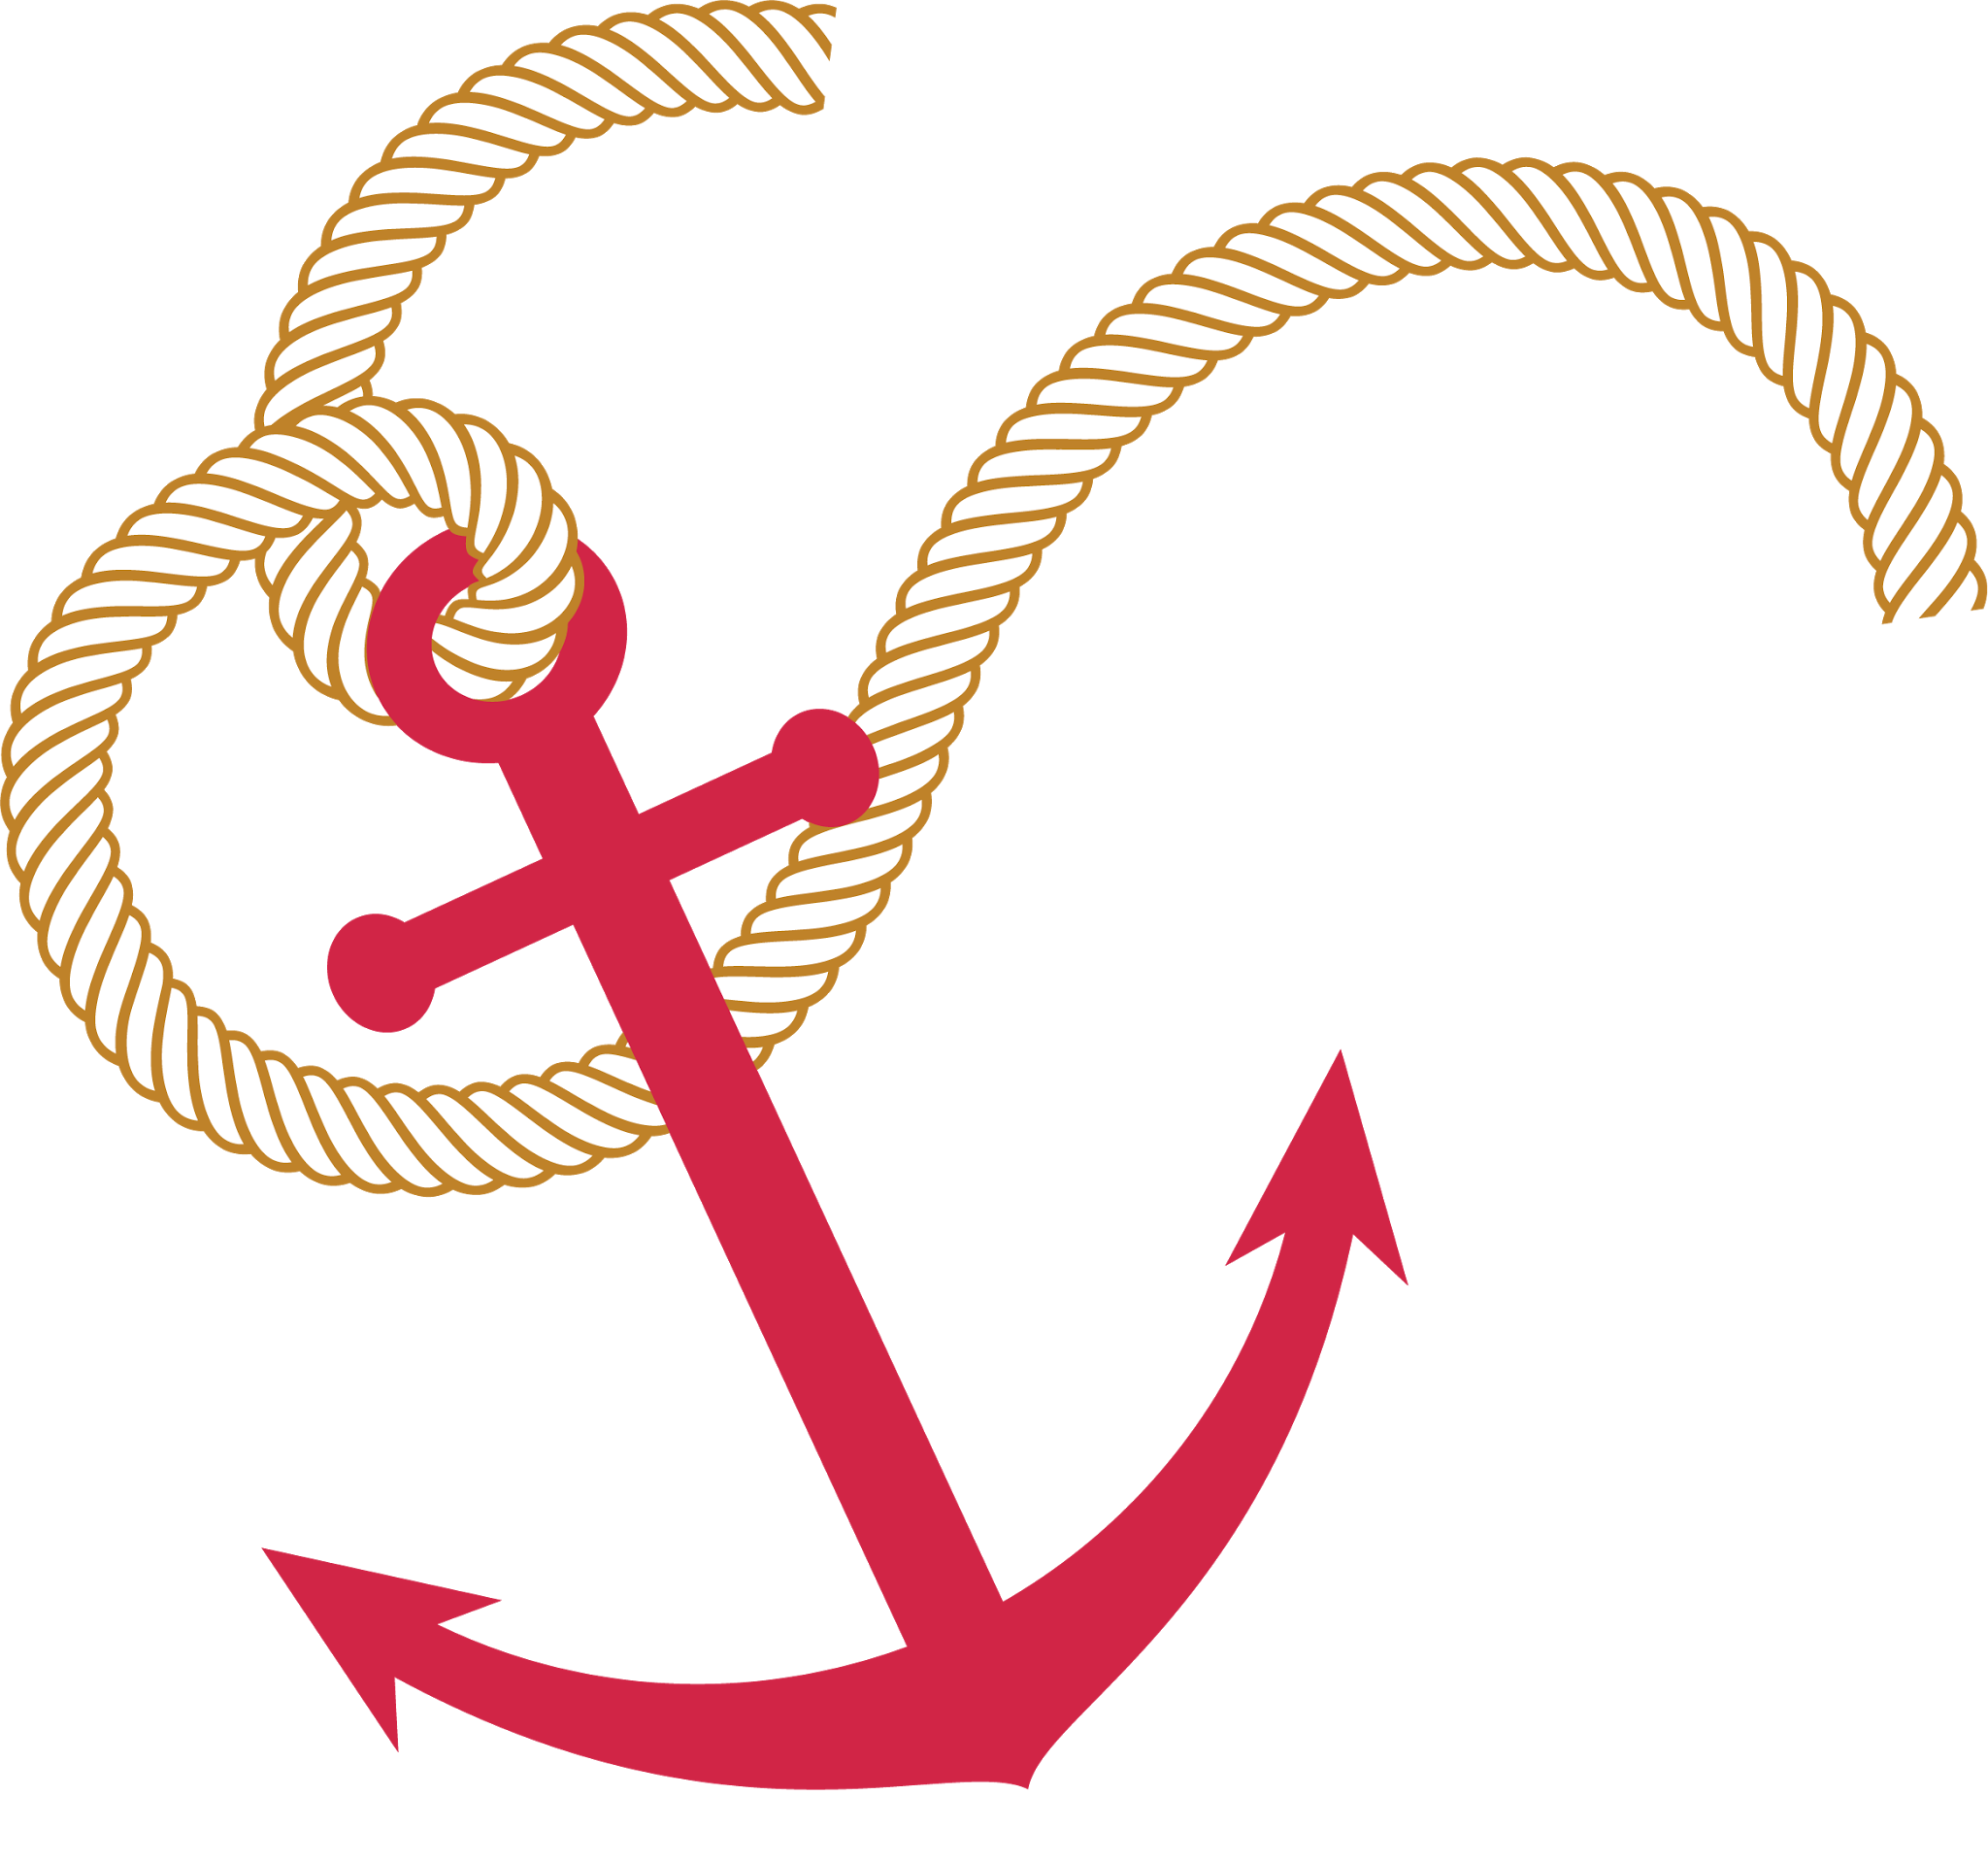 clip art transparent Nautical clipart symbol navy. Anchor applications for clothes.